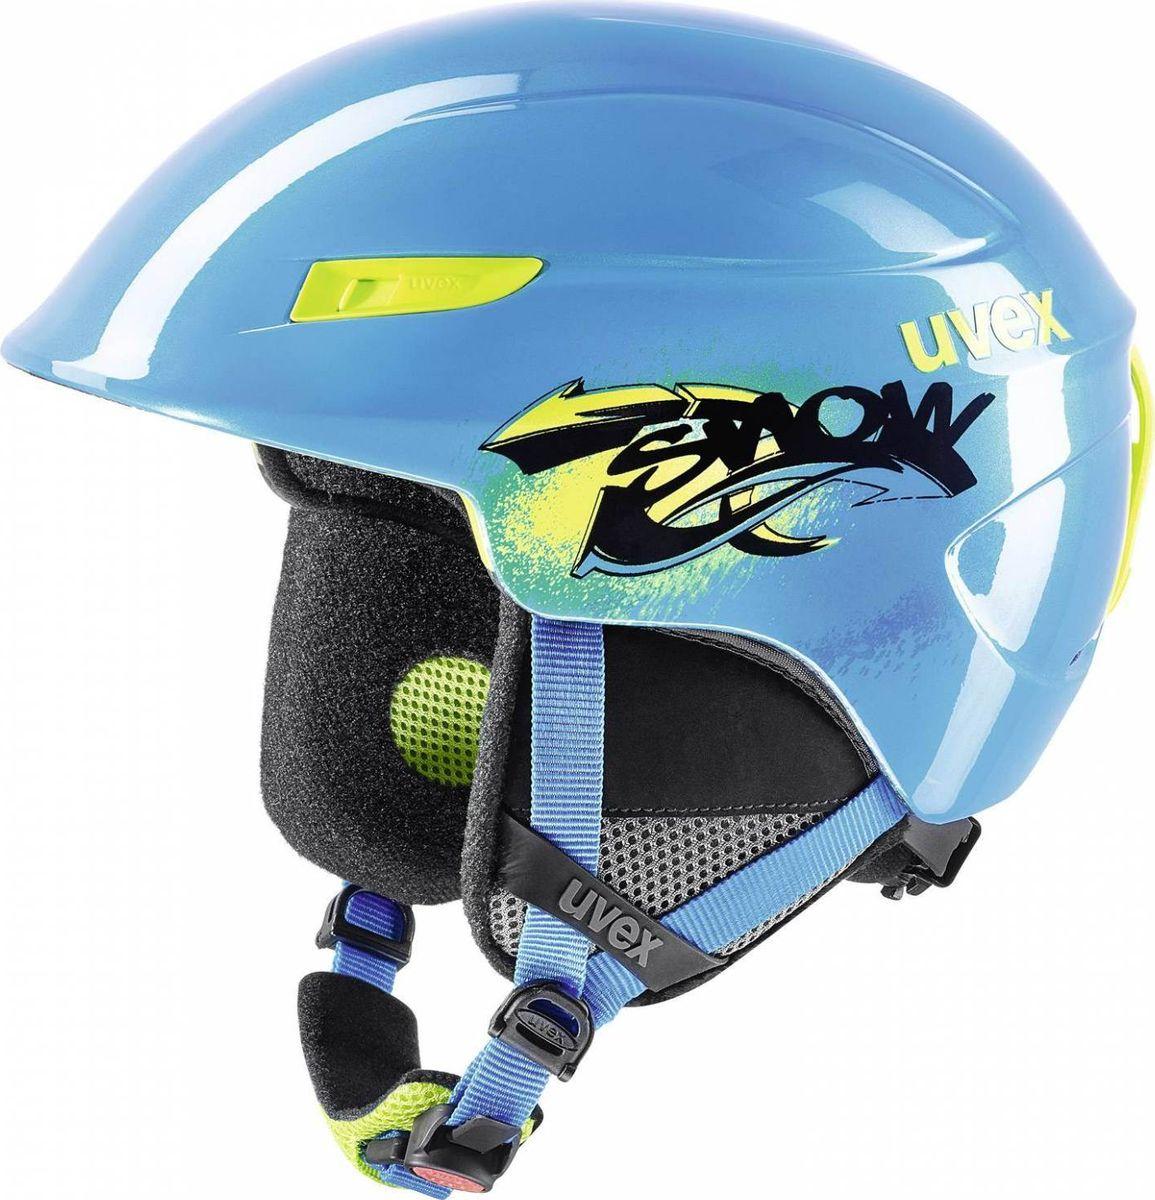 Шлем горнолыжный детский Uvex U-kid Kid's Helmet, цвет: синий. Размер 46/51 uvex маски горнолыжные